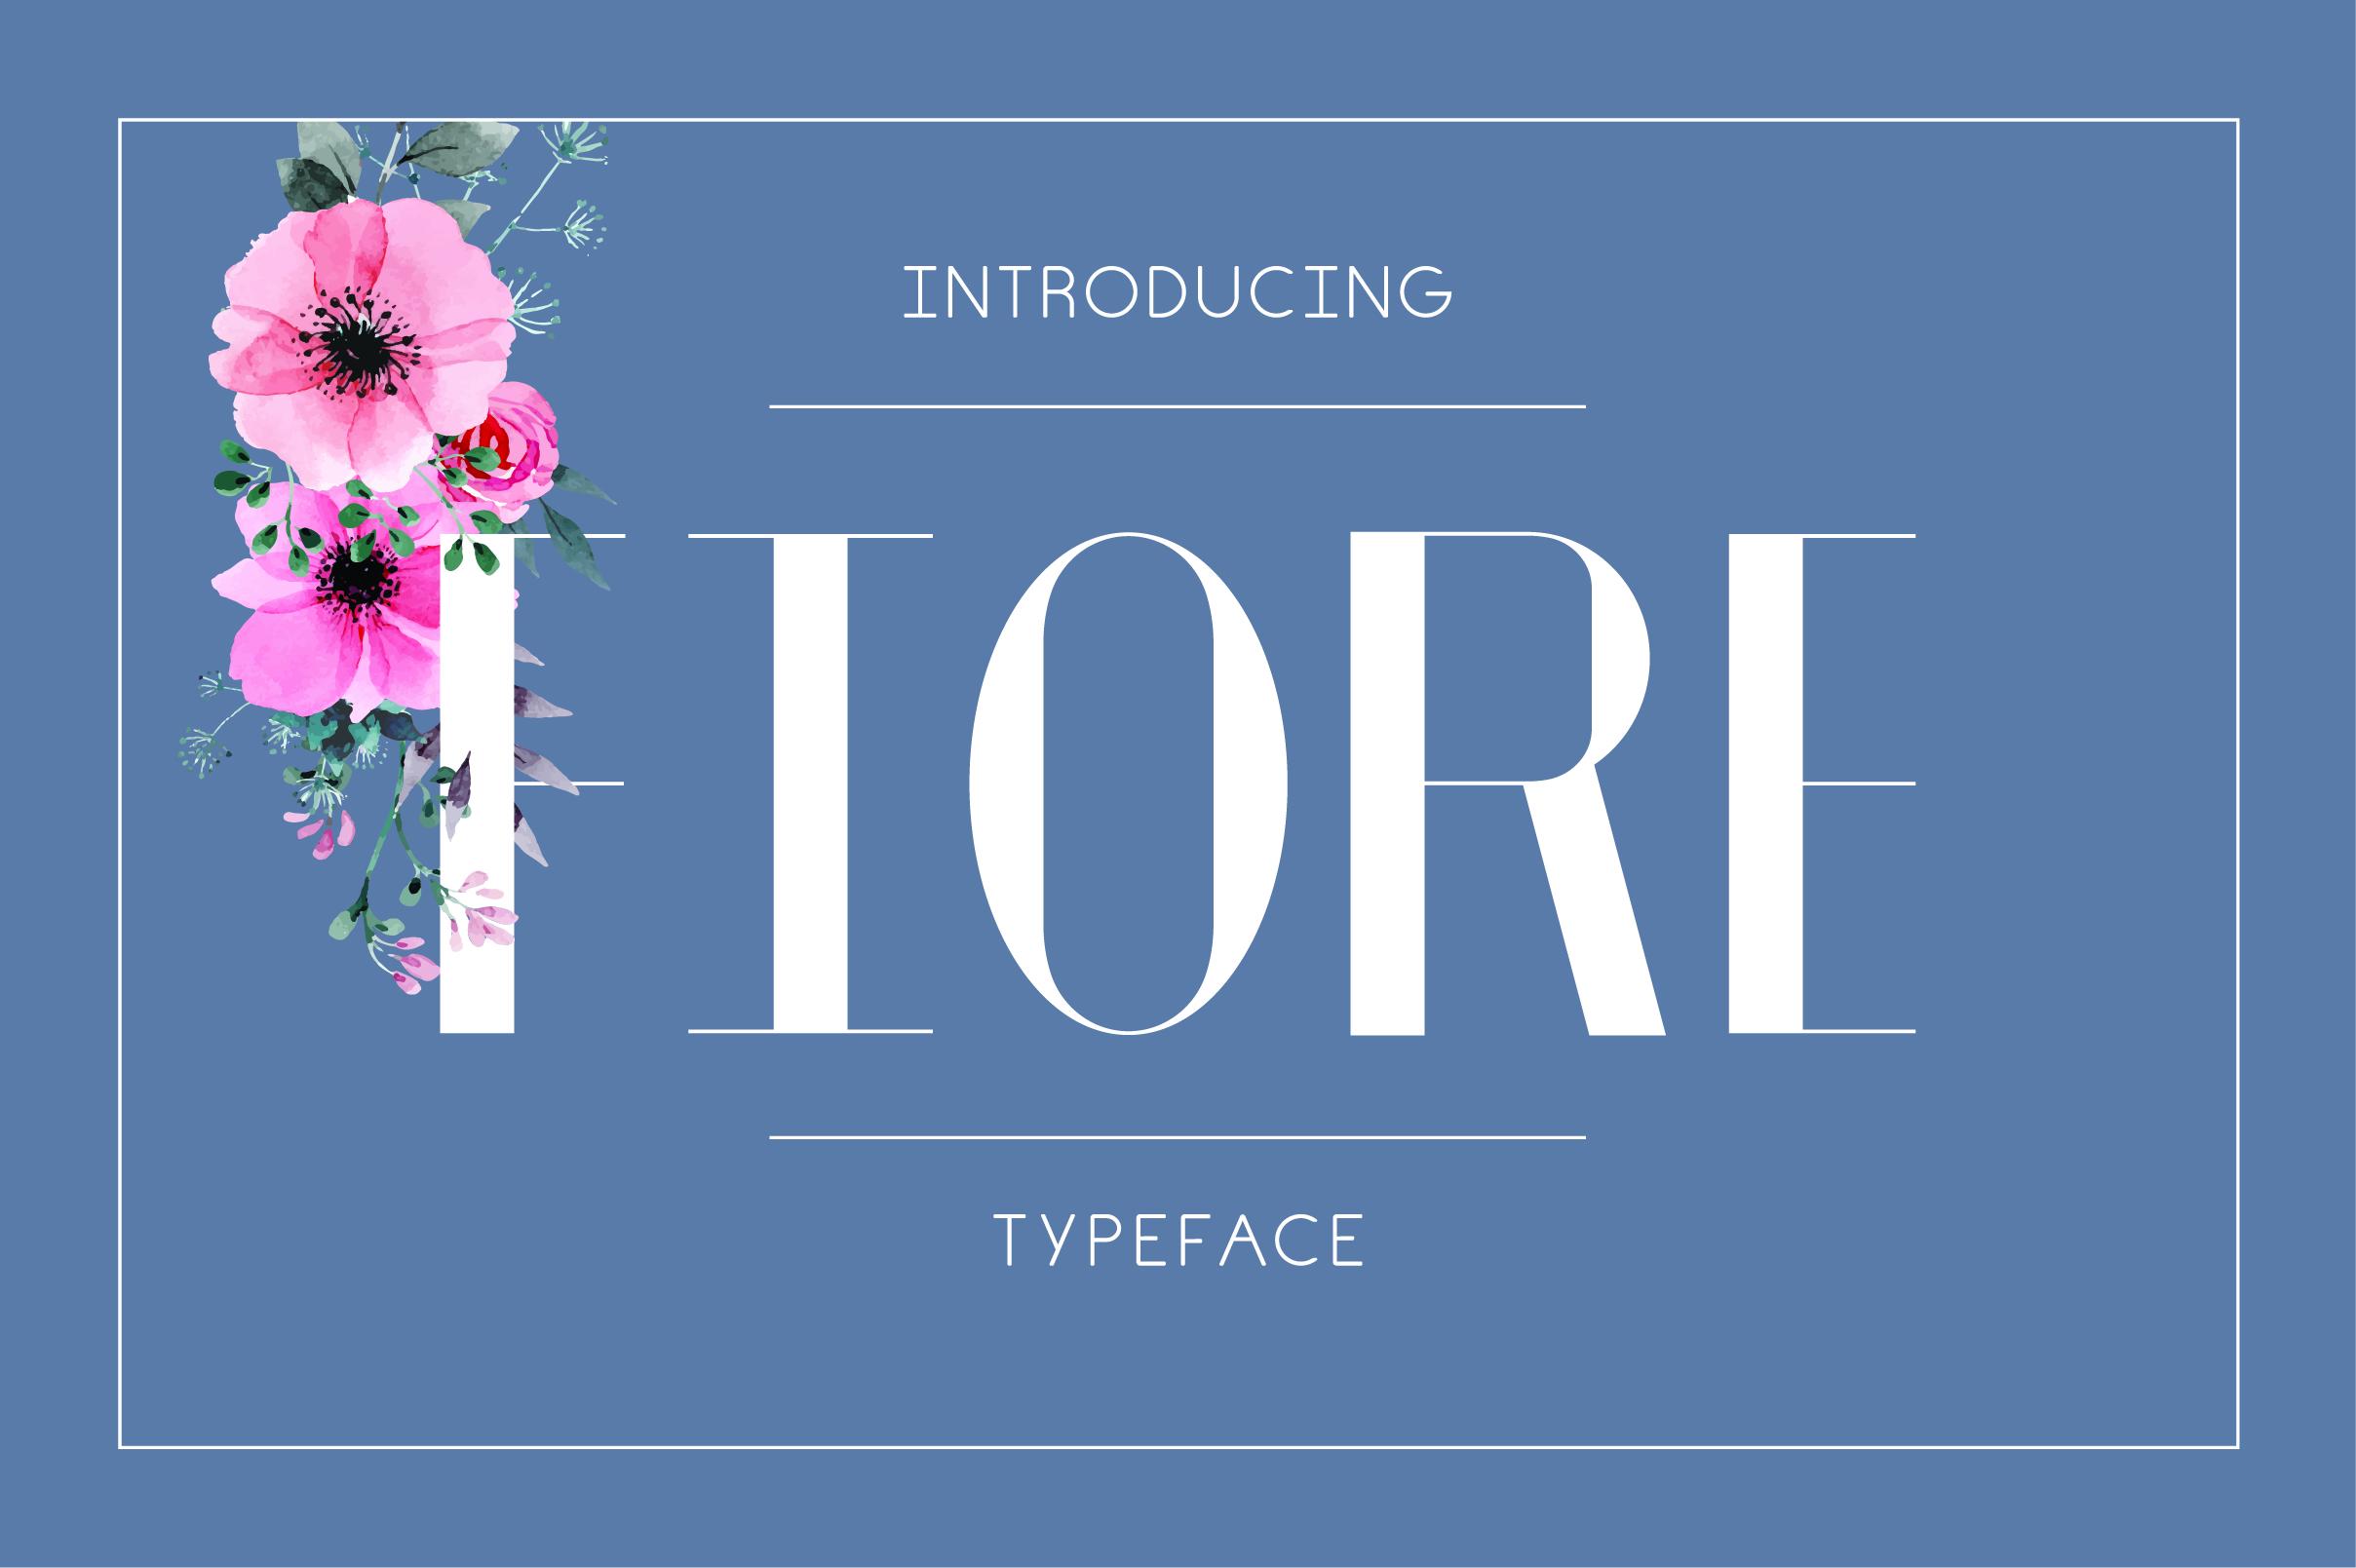 Fiore Typeface example image 1